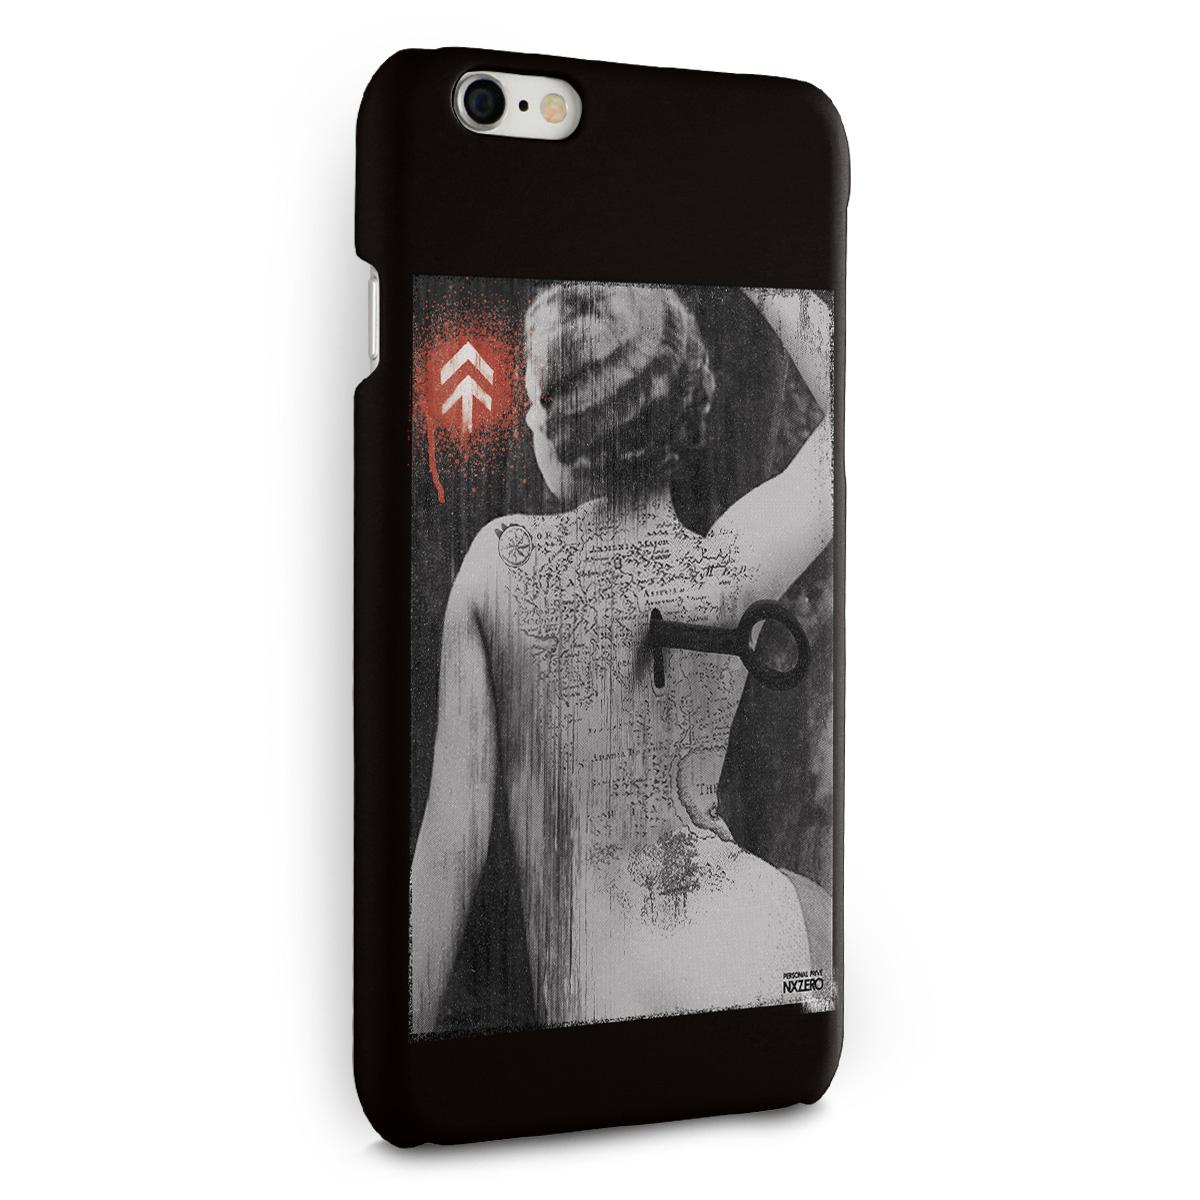 Capa para iPhone 6/6S Plus NXZero Personal Prive